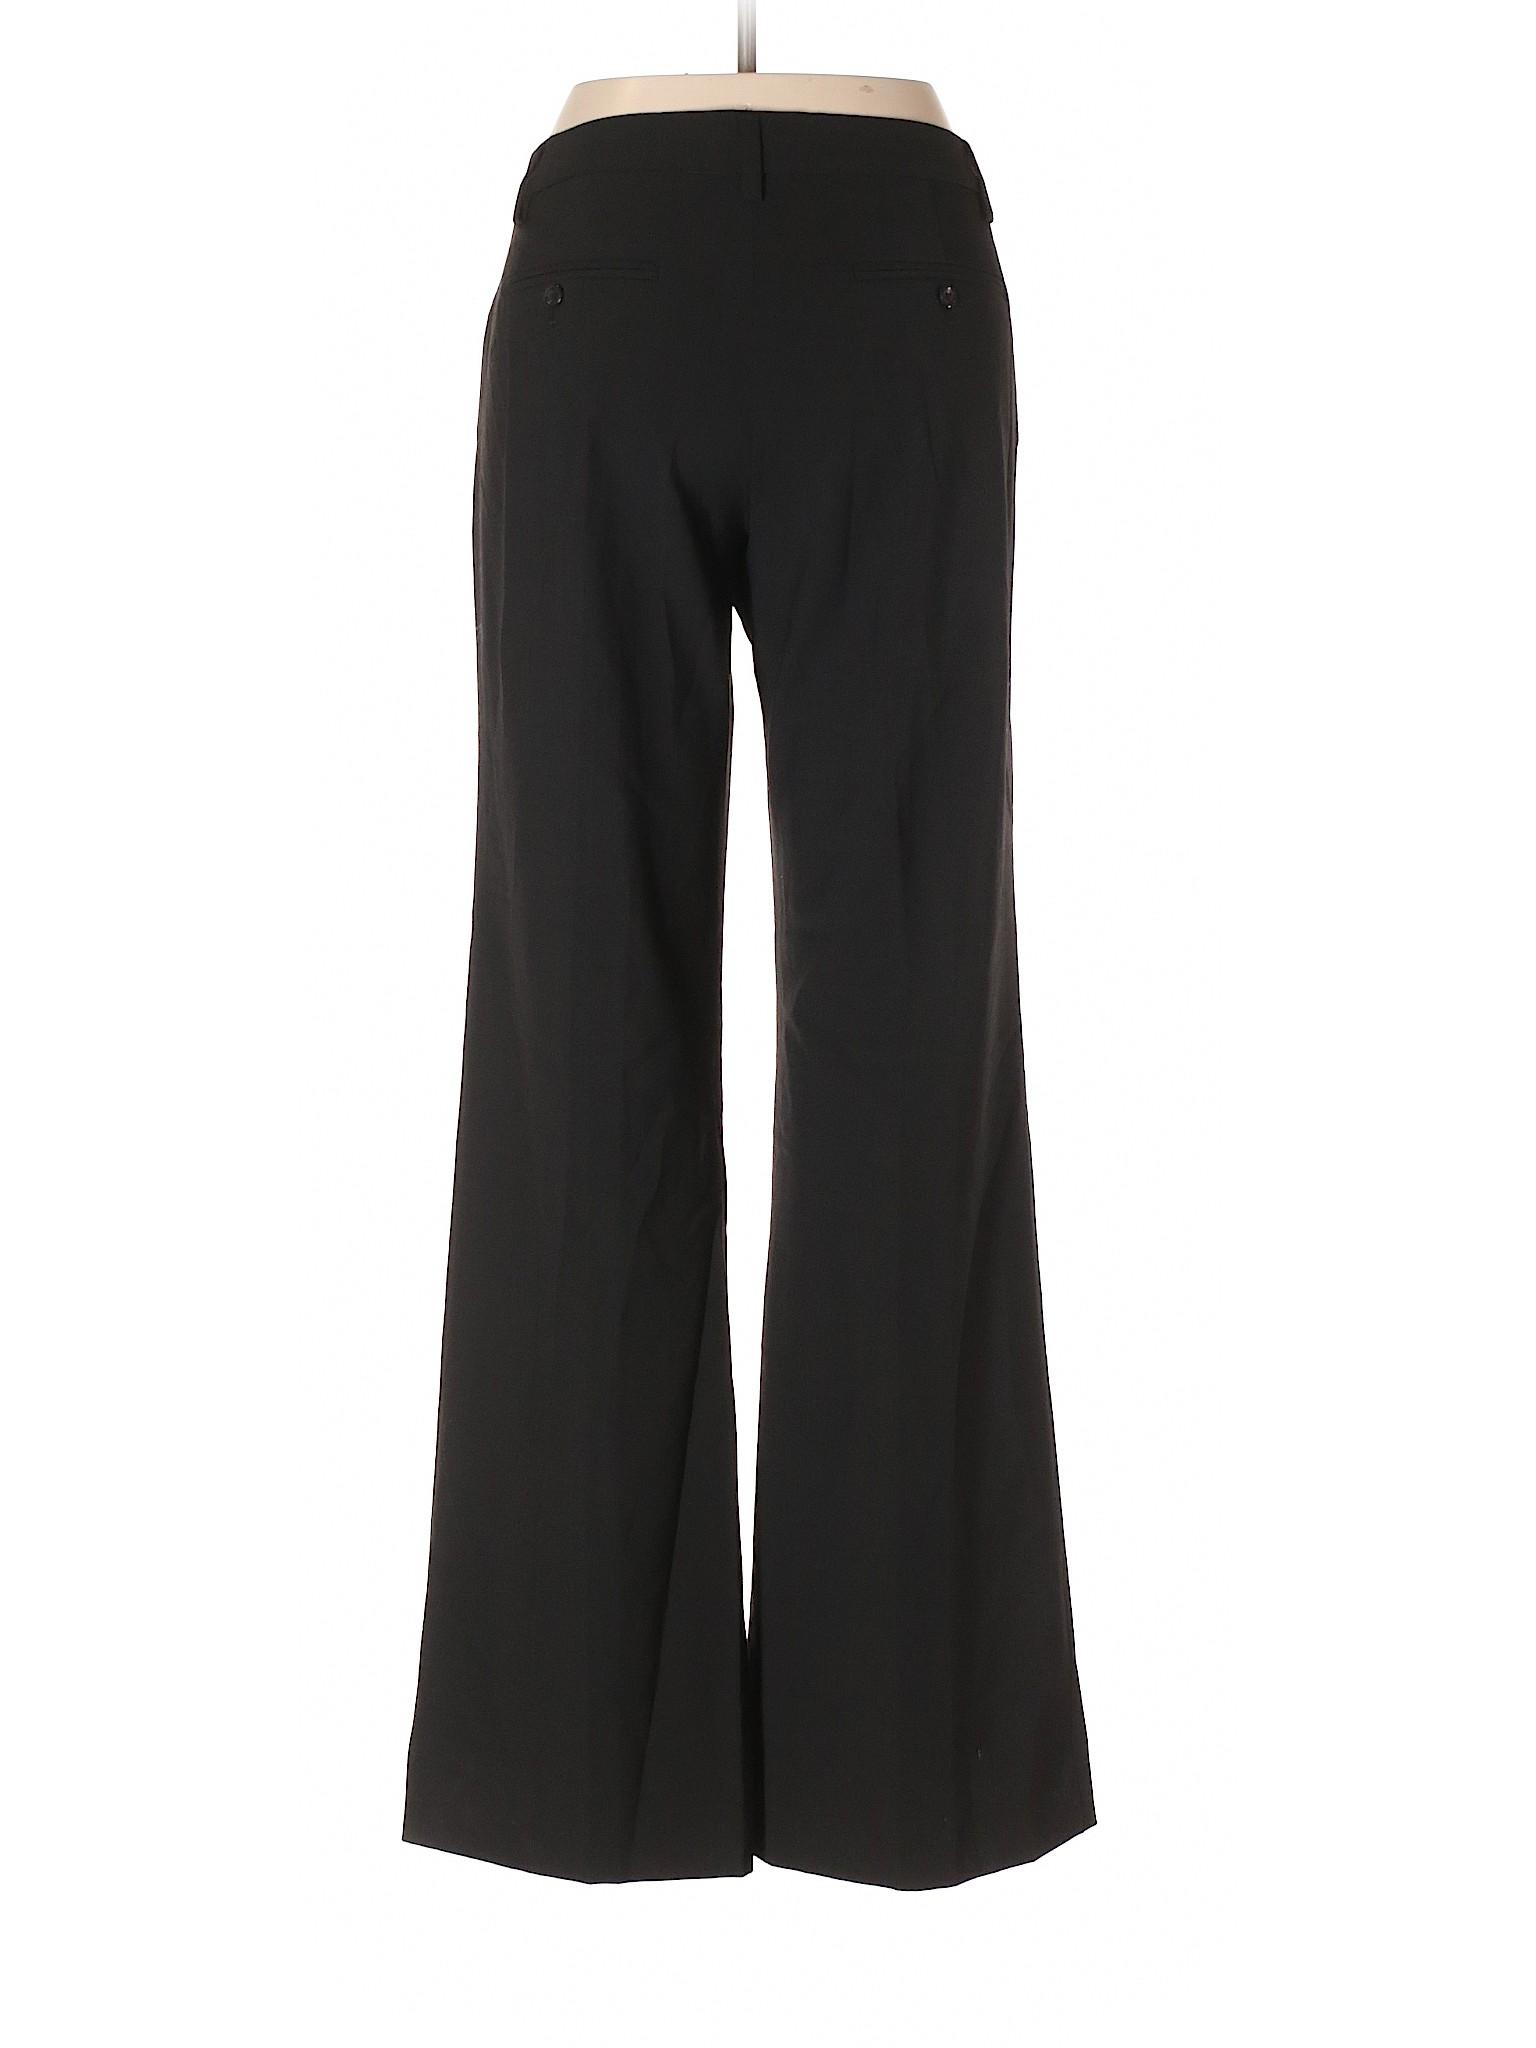 leisure leisure Pants Gap Pants leisure Dress Gap Boutique Boutique Gap Dress Boutique BwS8qUO